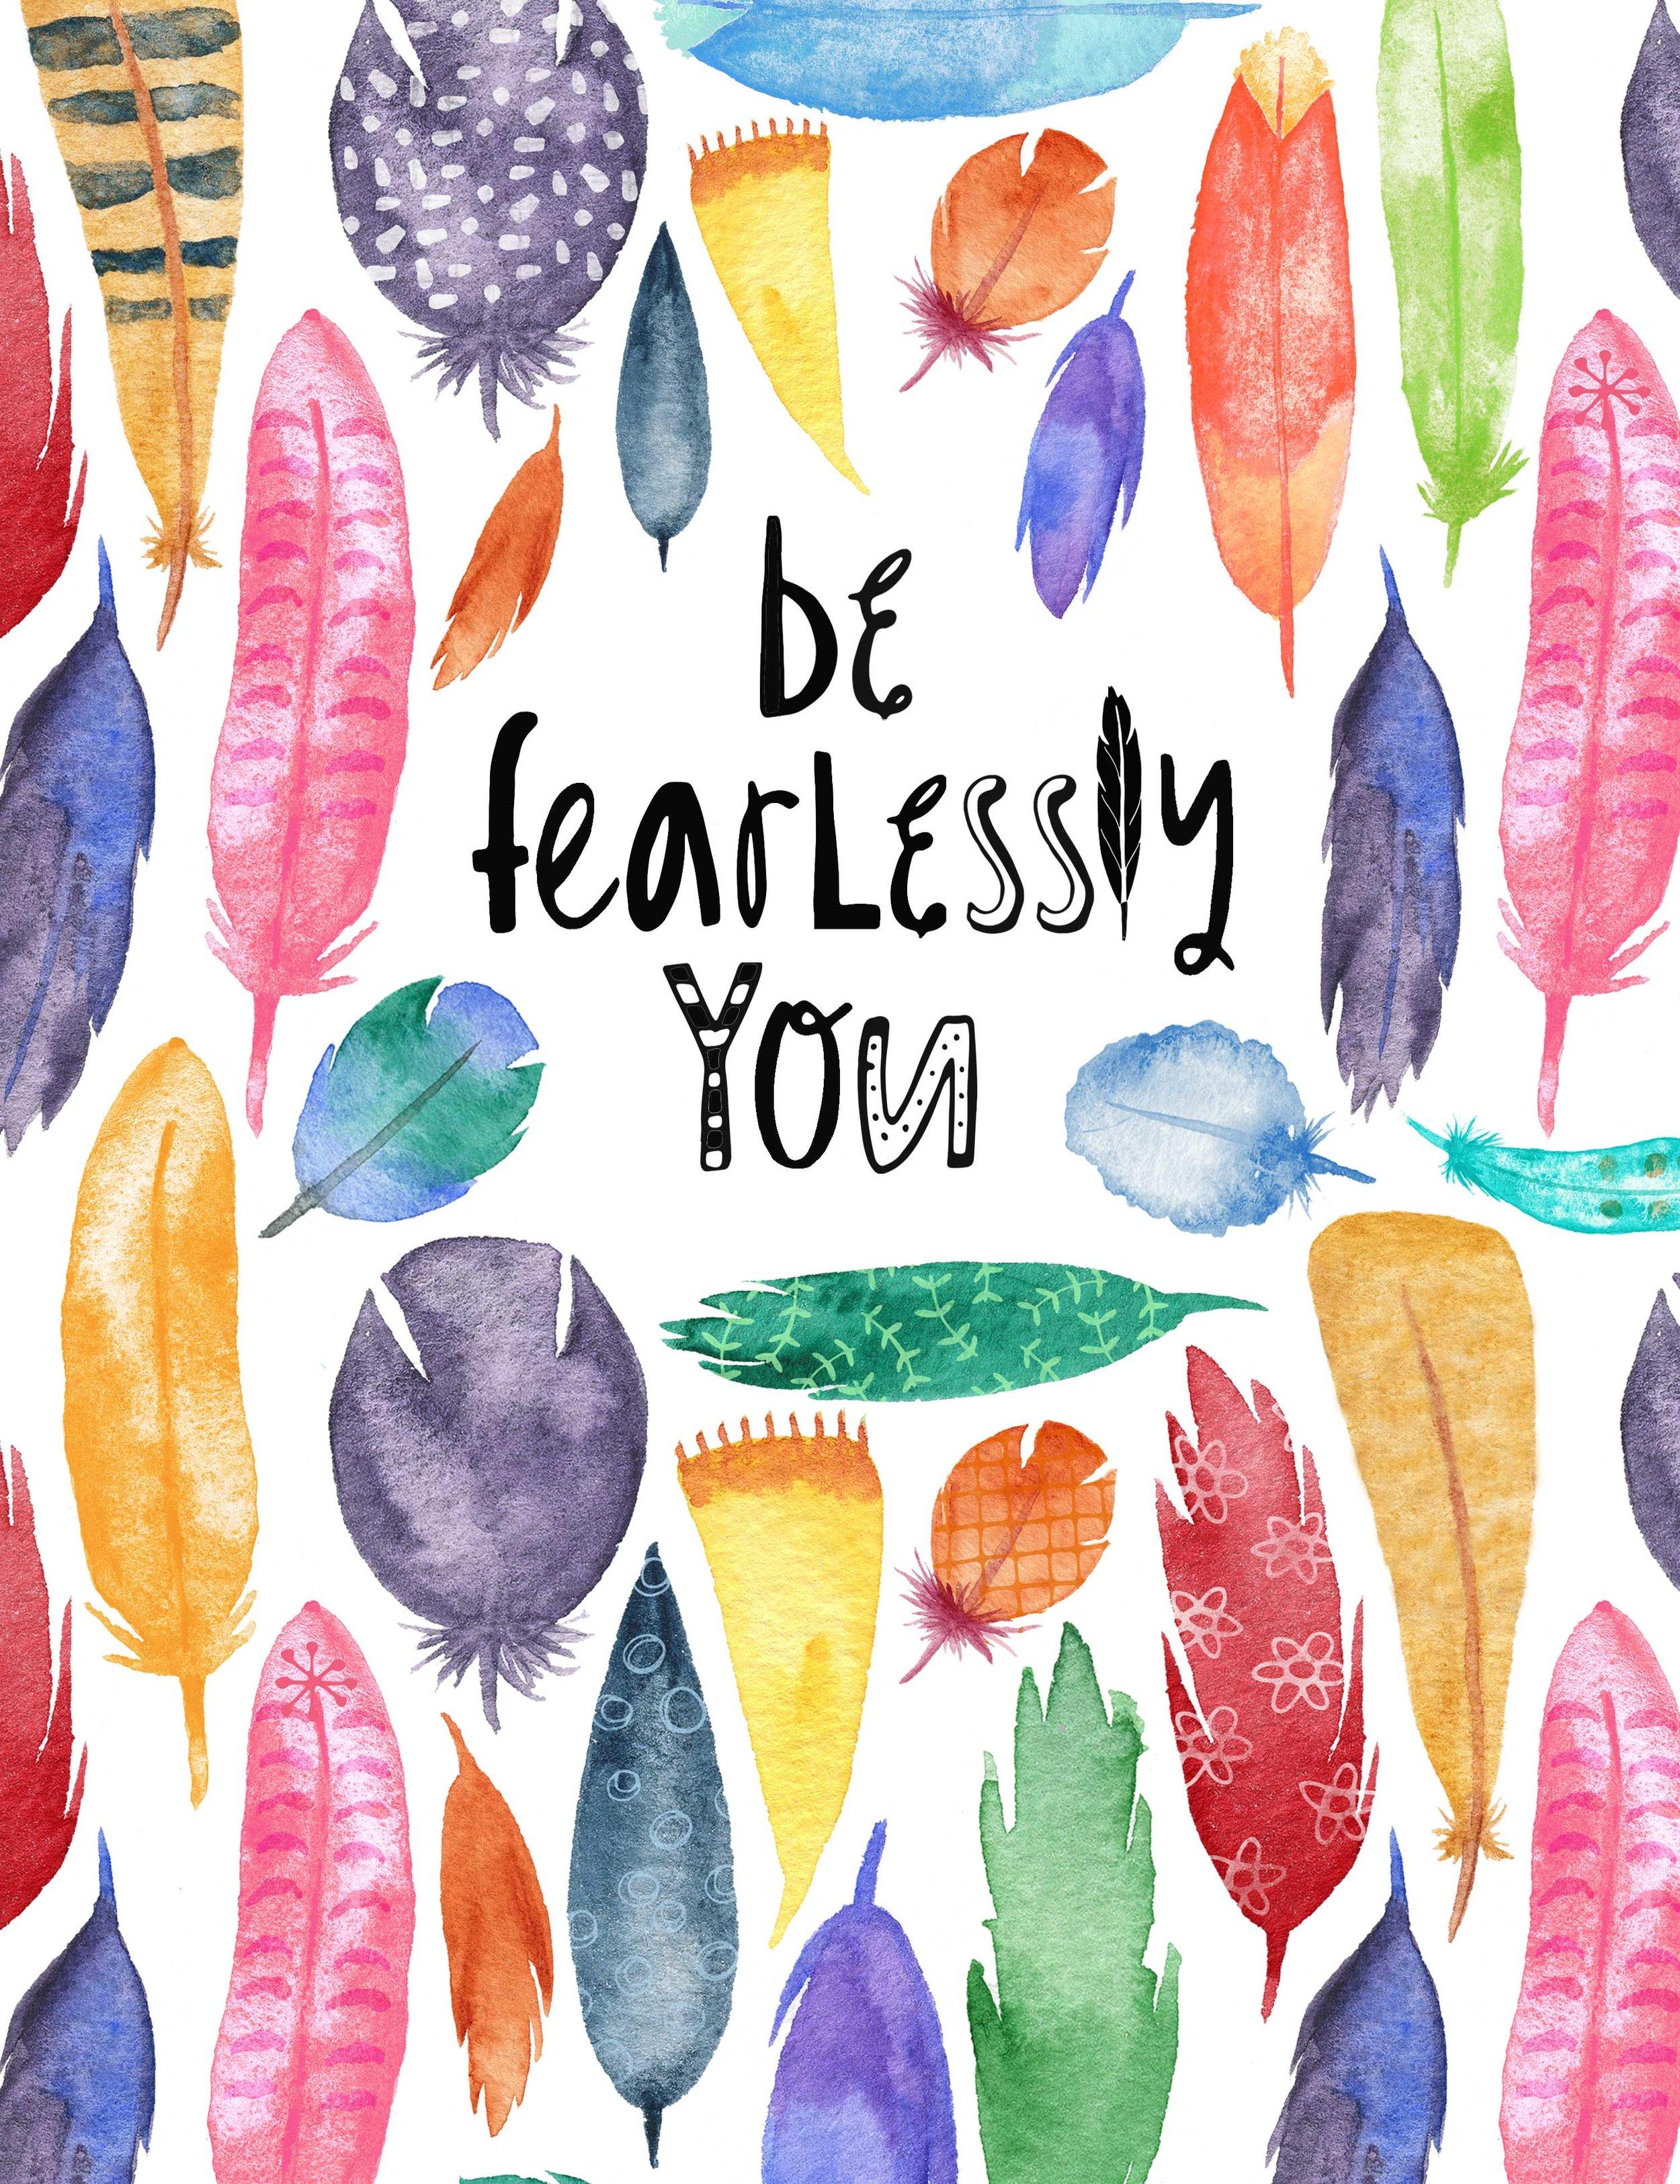 Elizatodd_be fearlessly you.jpg